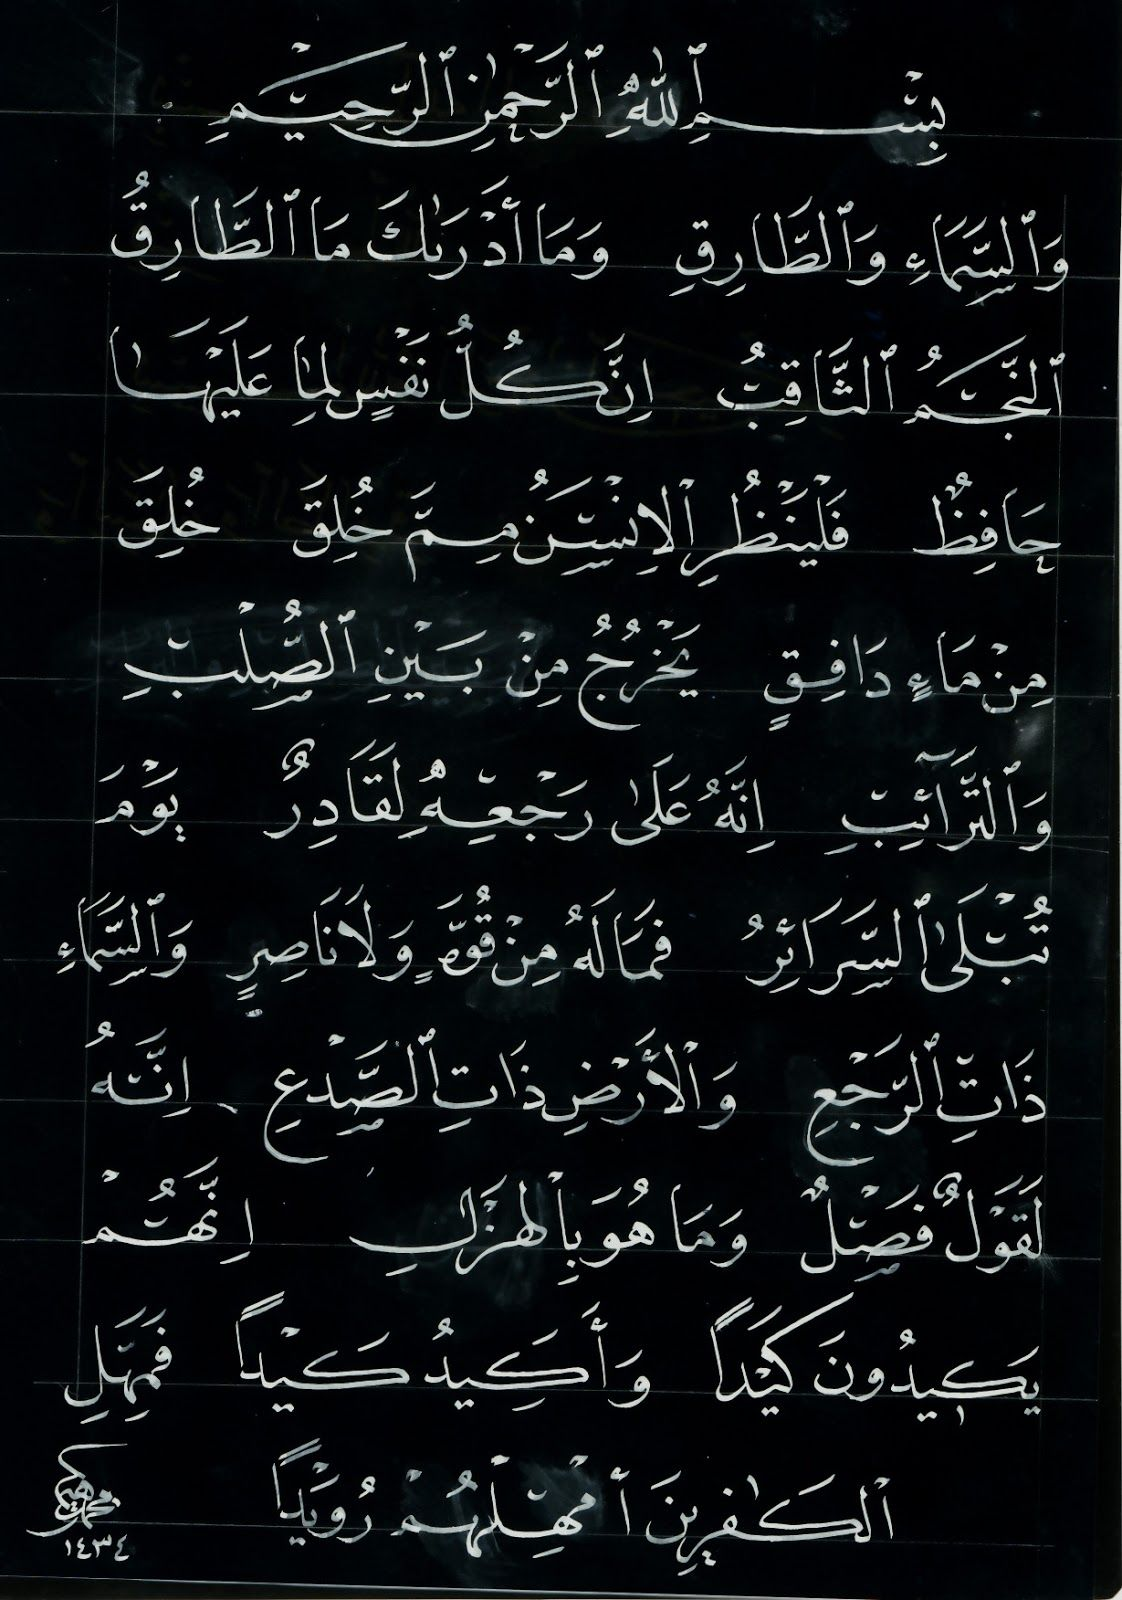 سورة الطارق Calligraphy Art Islamic Calligraphy Afghan Quotes